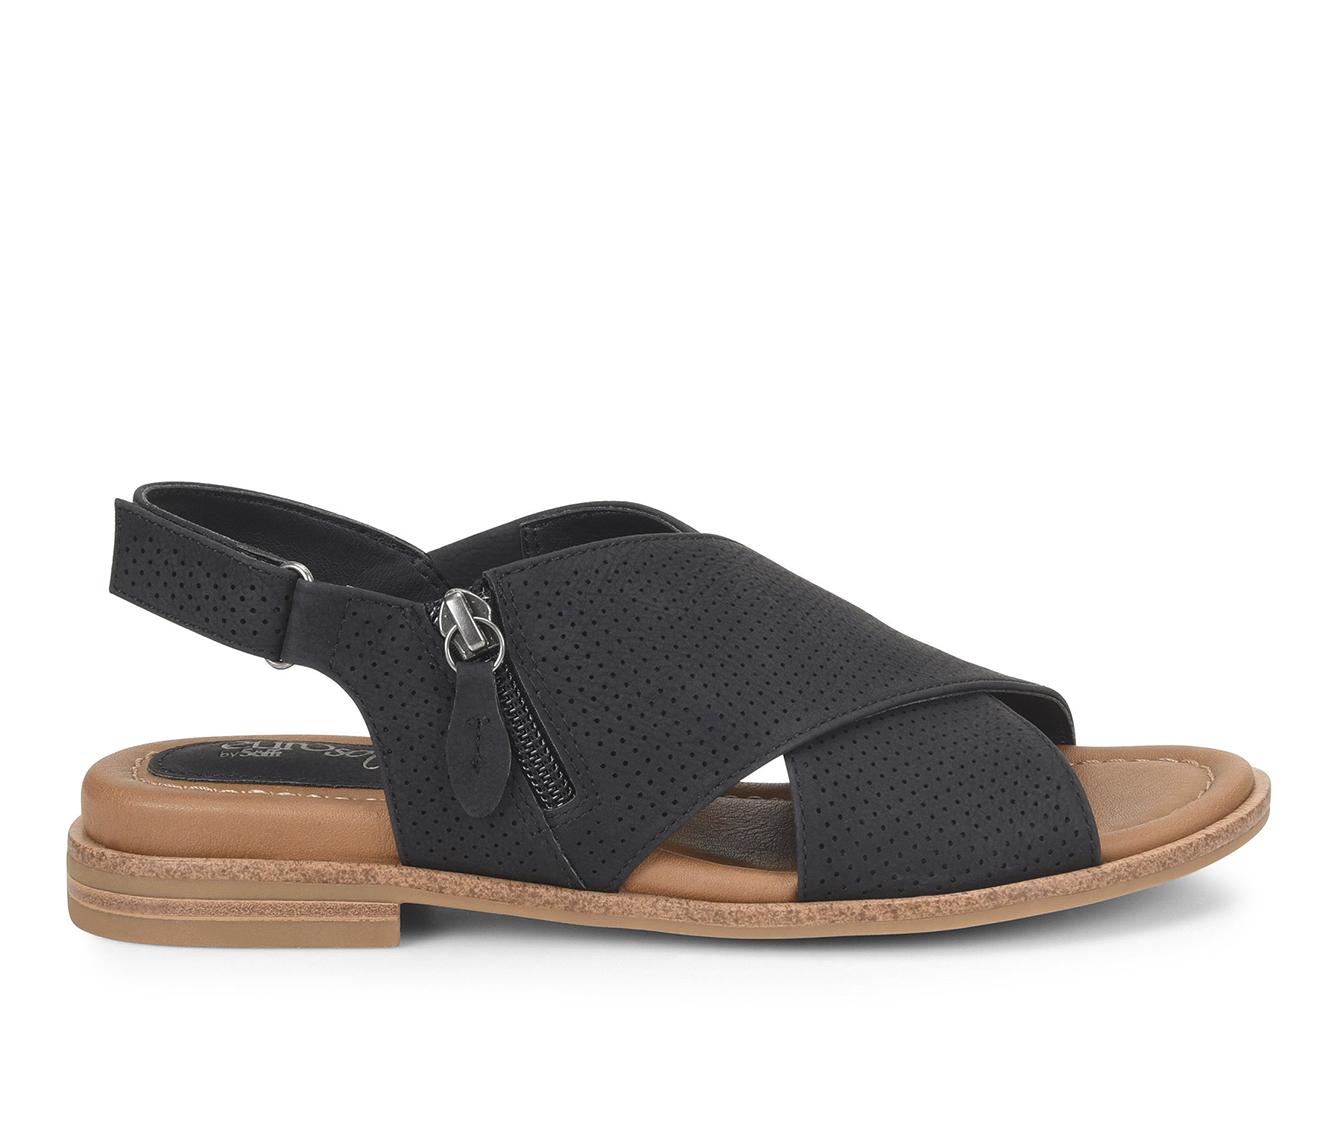 EuroSoft Darla Women's Sandal (Black Faux Leather)